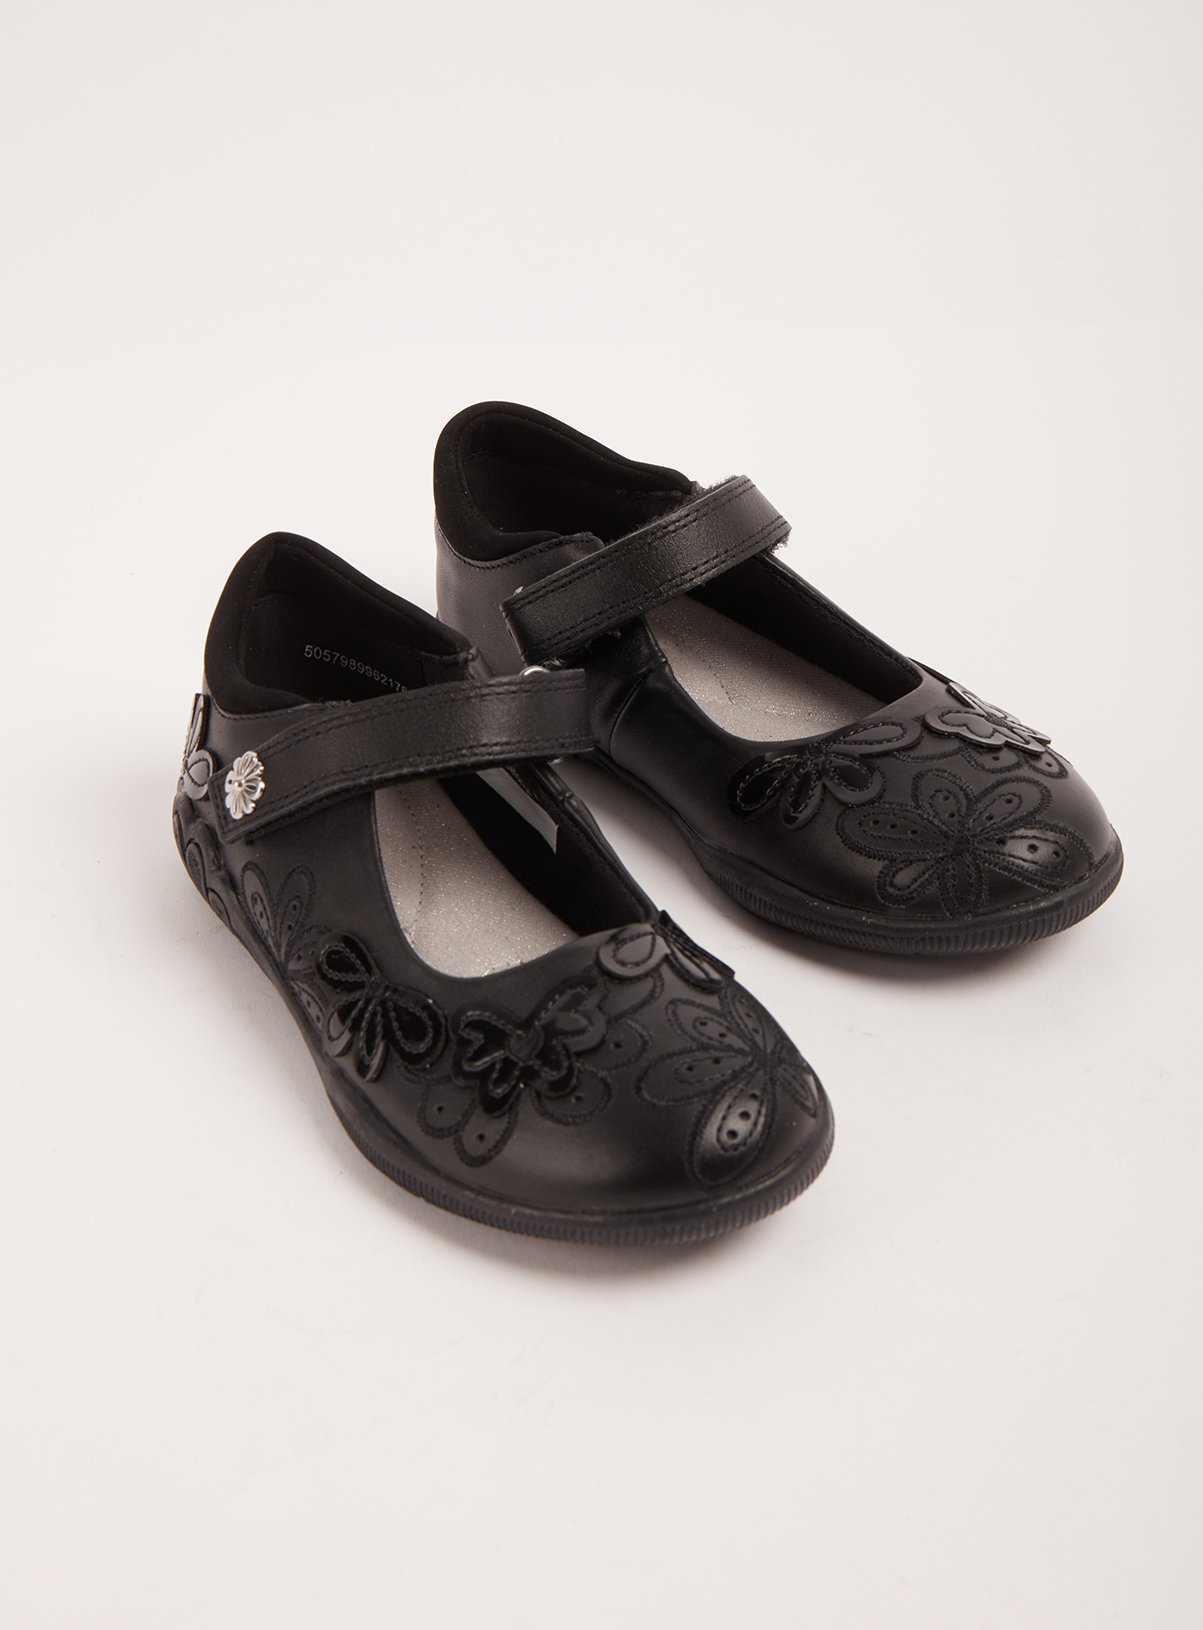 Black Floral Leather School Shoes - Half Sizes - 1